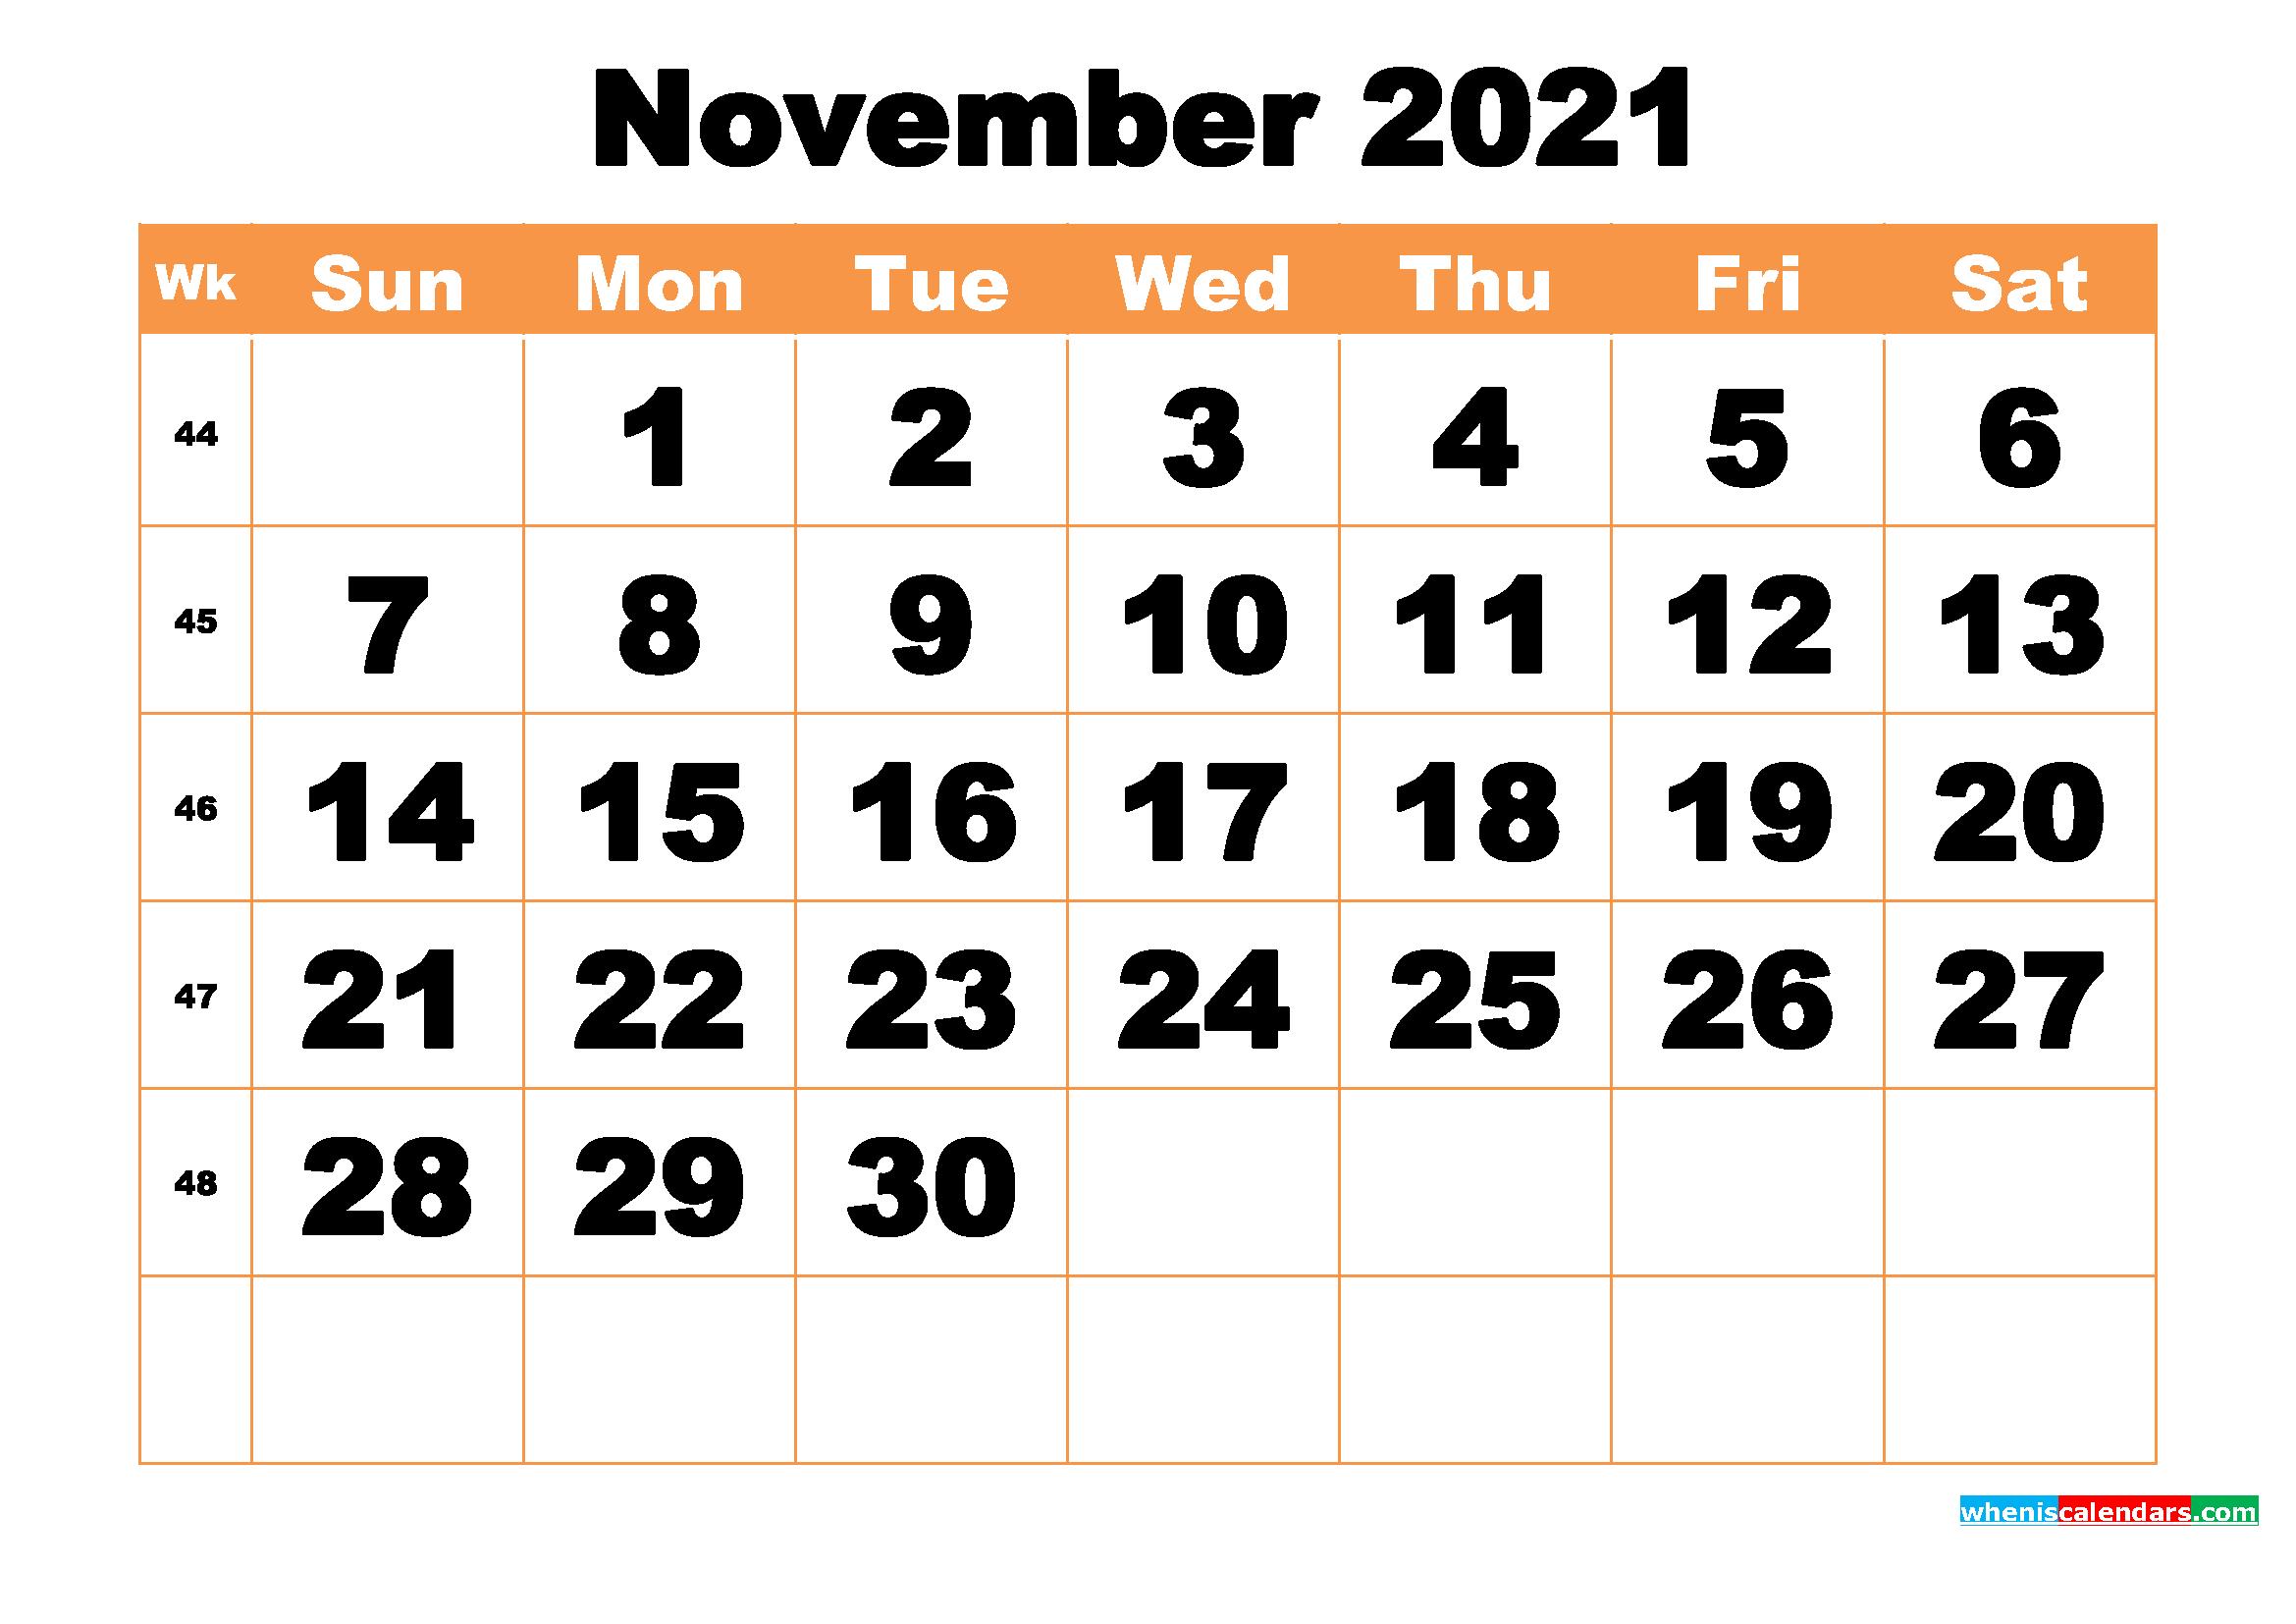 Free Printable November 2021 Calendar Word, PDF, Image ...